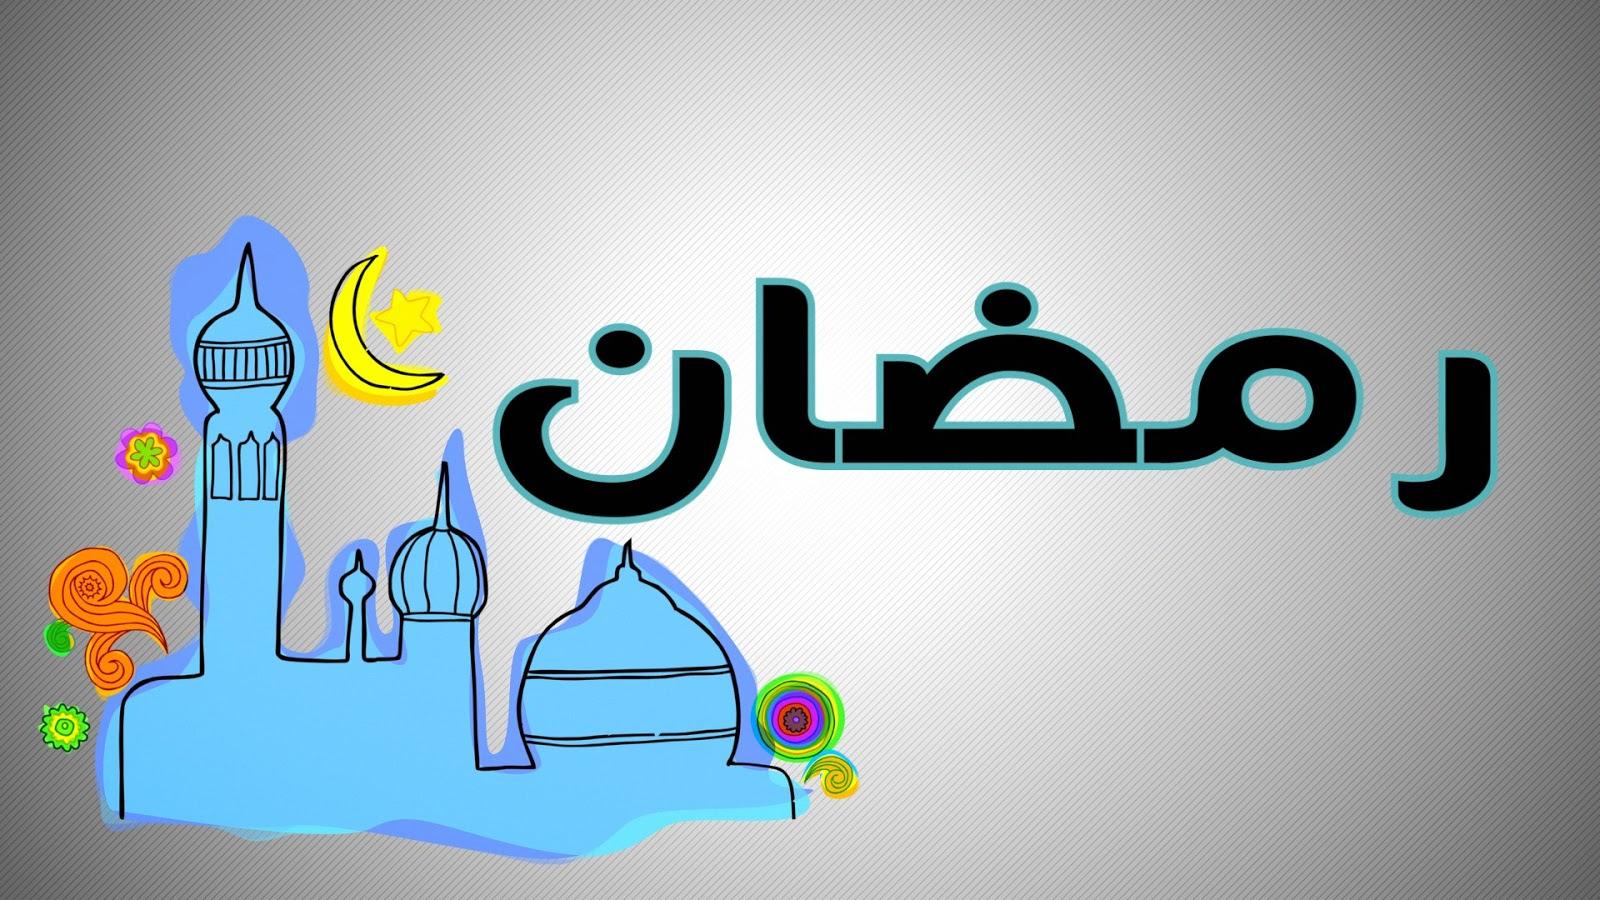 صورة فيديو عن رمضان , شاهد اجمل الفيديوهات عن رمضان